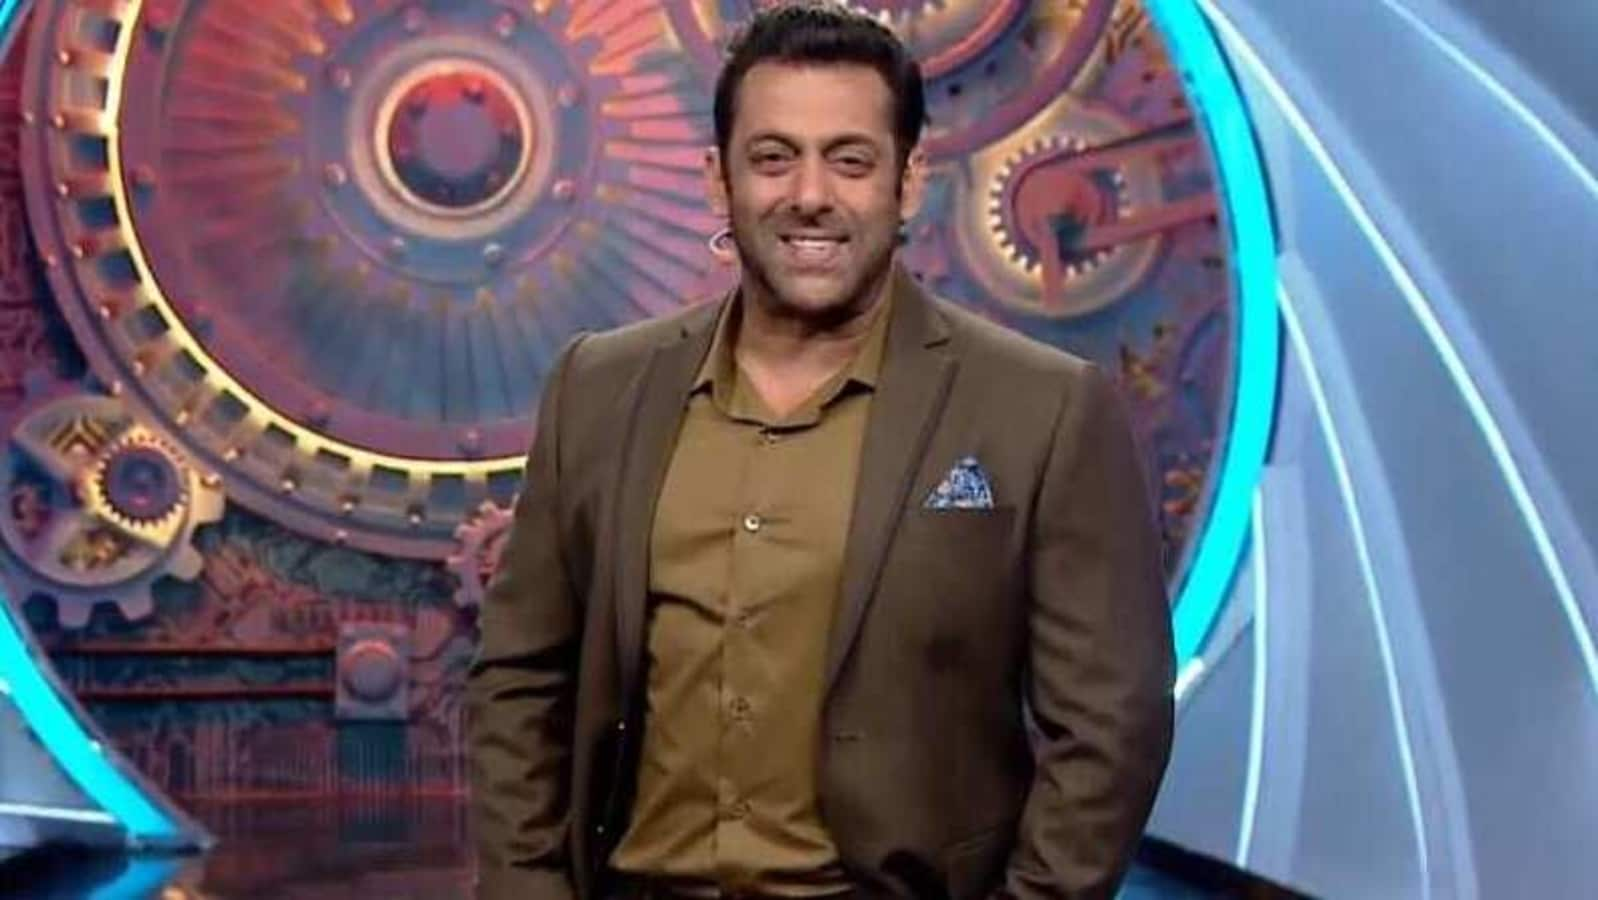 Bigg Boss 14: Salman Khan jokes he will return for next season only if he  gets a 15 percent raise - Hindustan Times